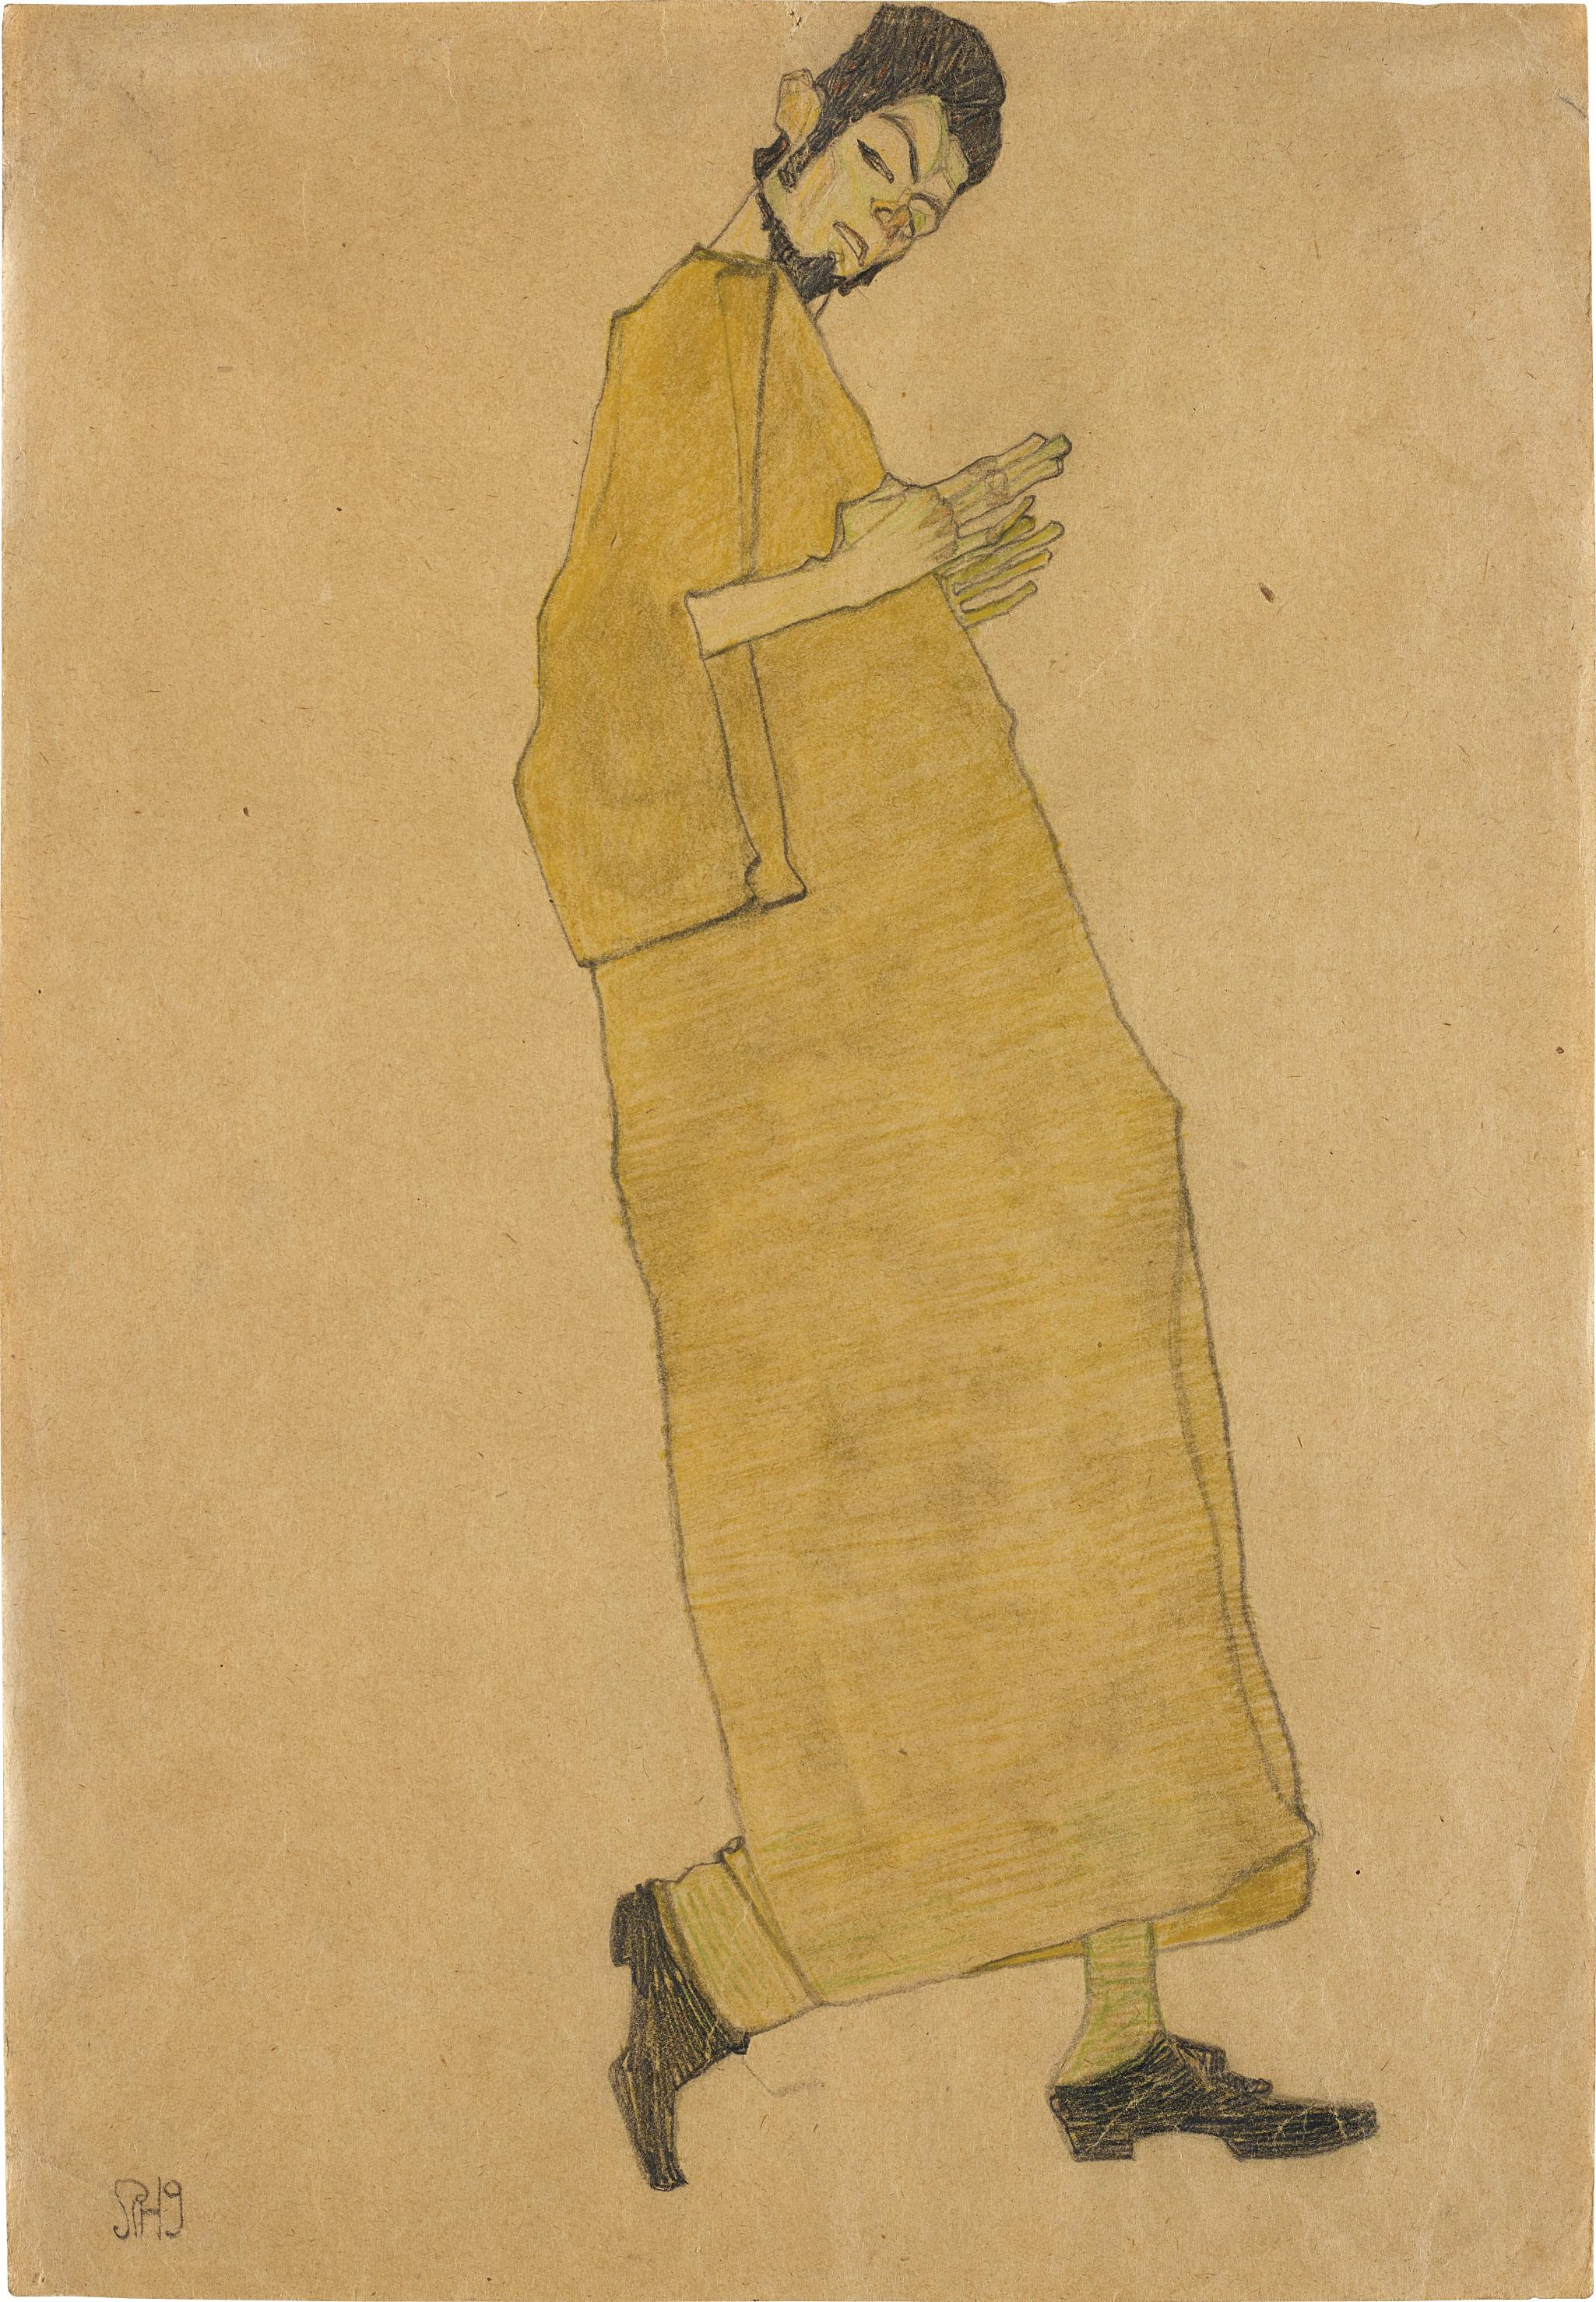 Egon Schiele-Manliche Figur Nach Rechts (Selbstportrat) Male Figure Facing Right (Self Portrait)-1909